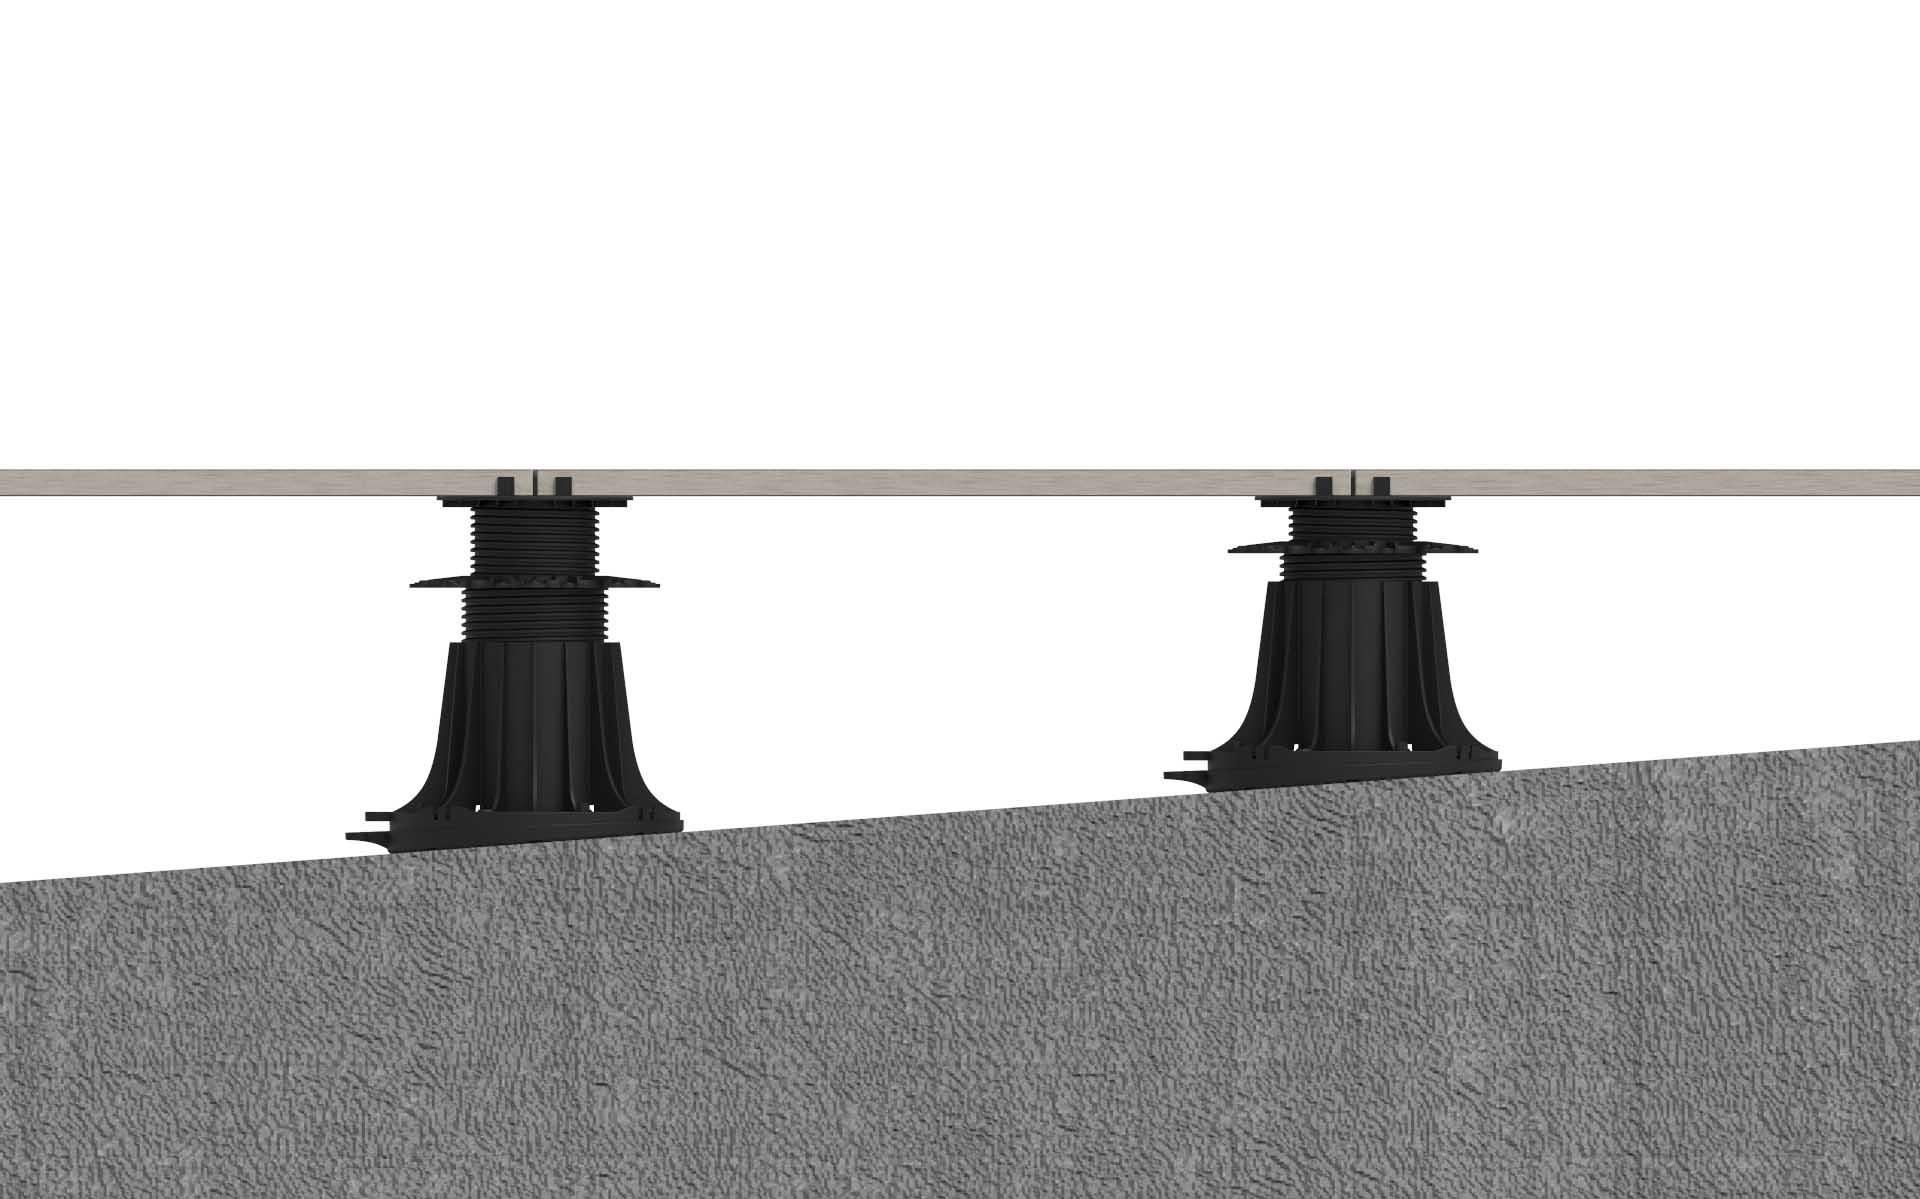 PILLAR PAGE PILLAR PAGE 100% 8 P653 compensating for a large slope on the terrace slab with a slope corrector Obsługa czytników ekranu włączona. compensating for a large slope on the terrace slab with a slope corrector Włącz obsługę czytnika ekranu